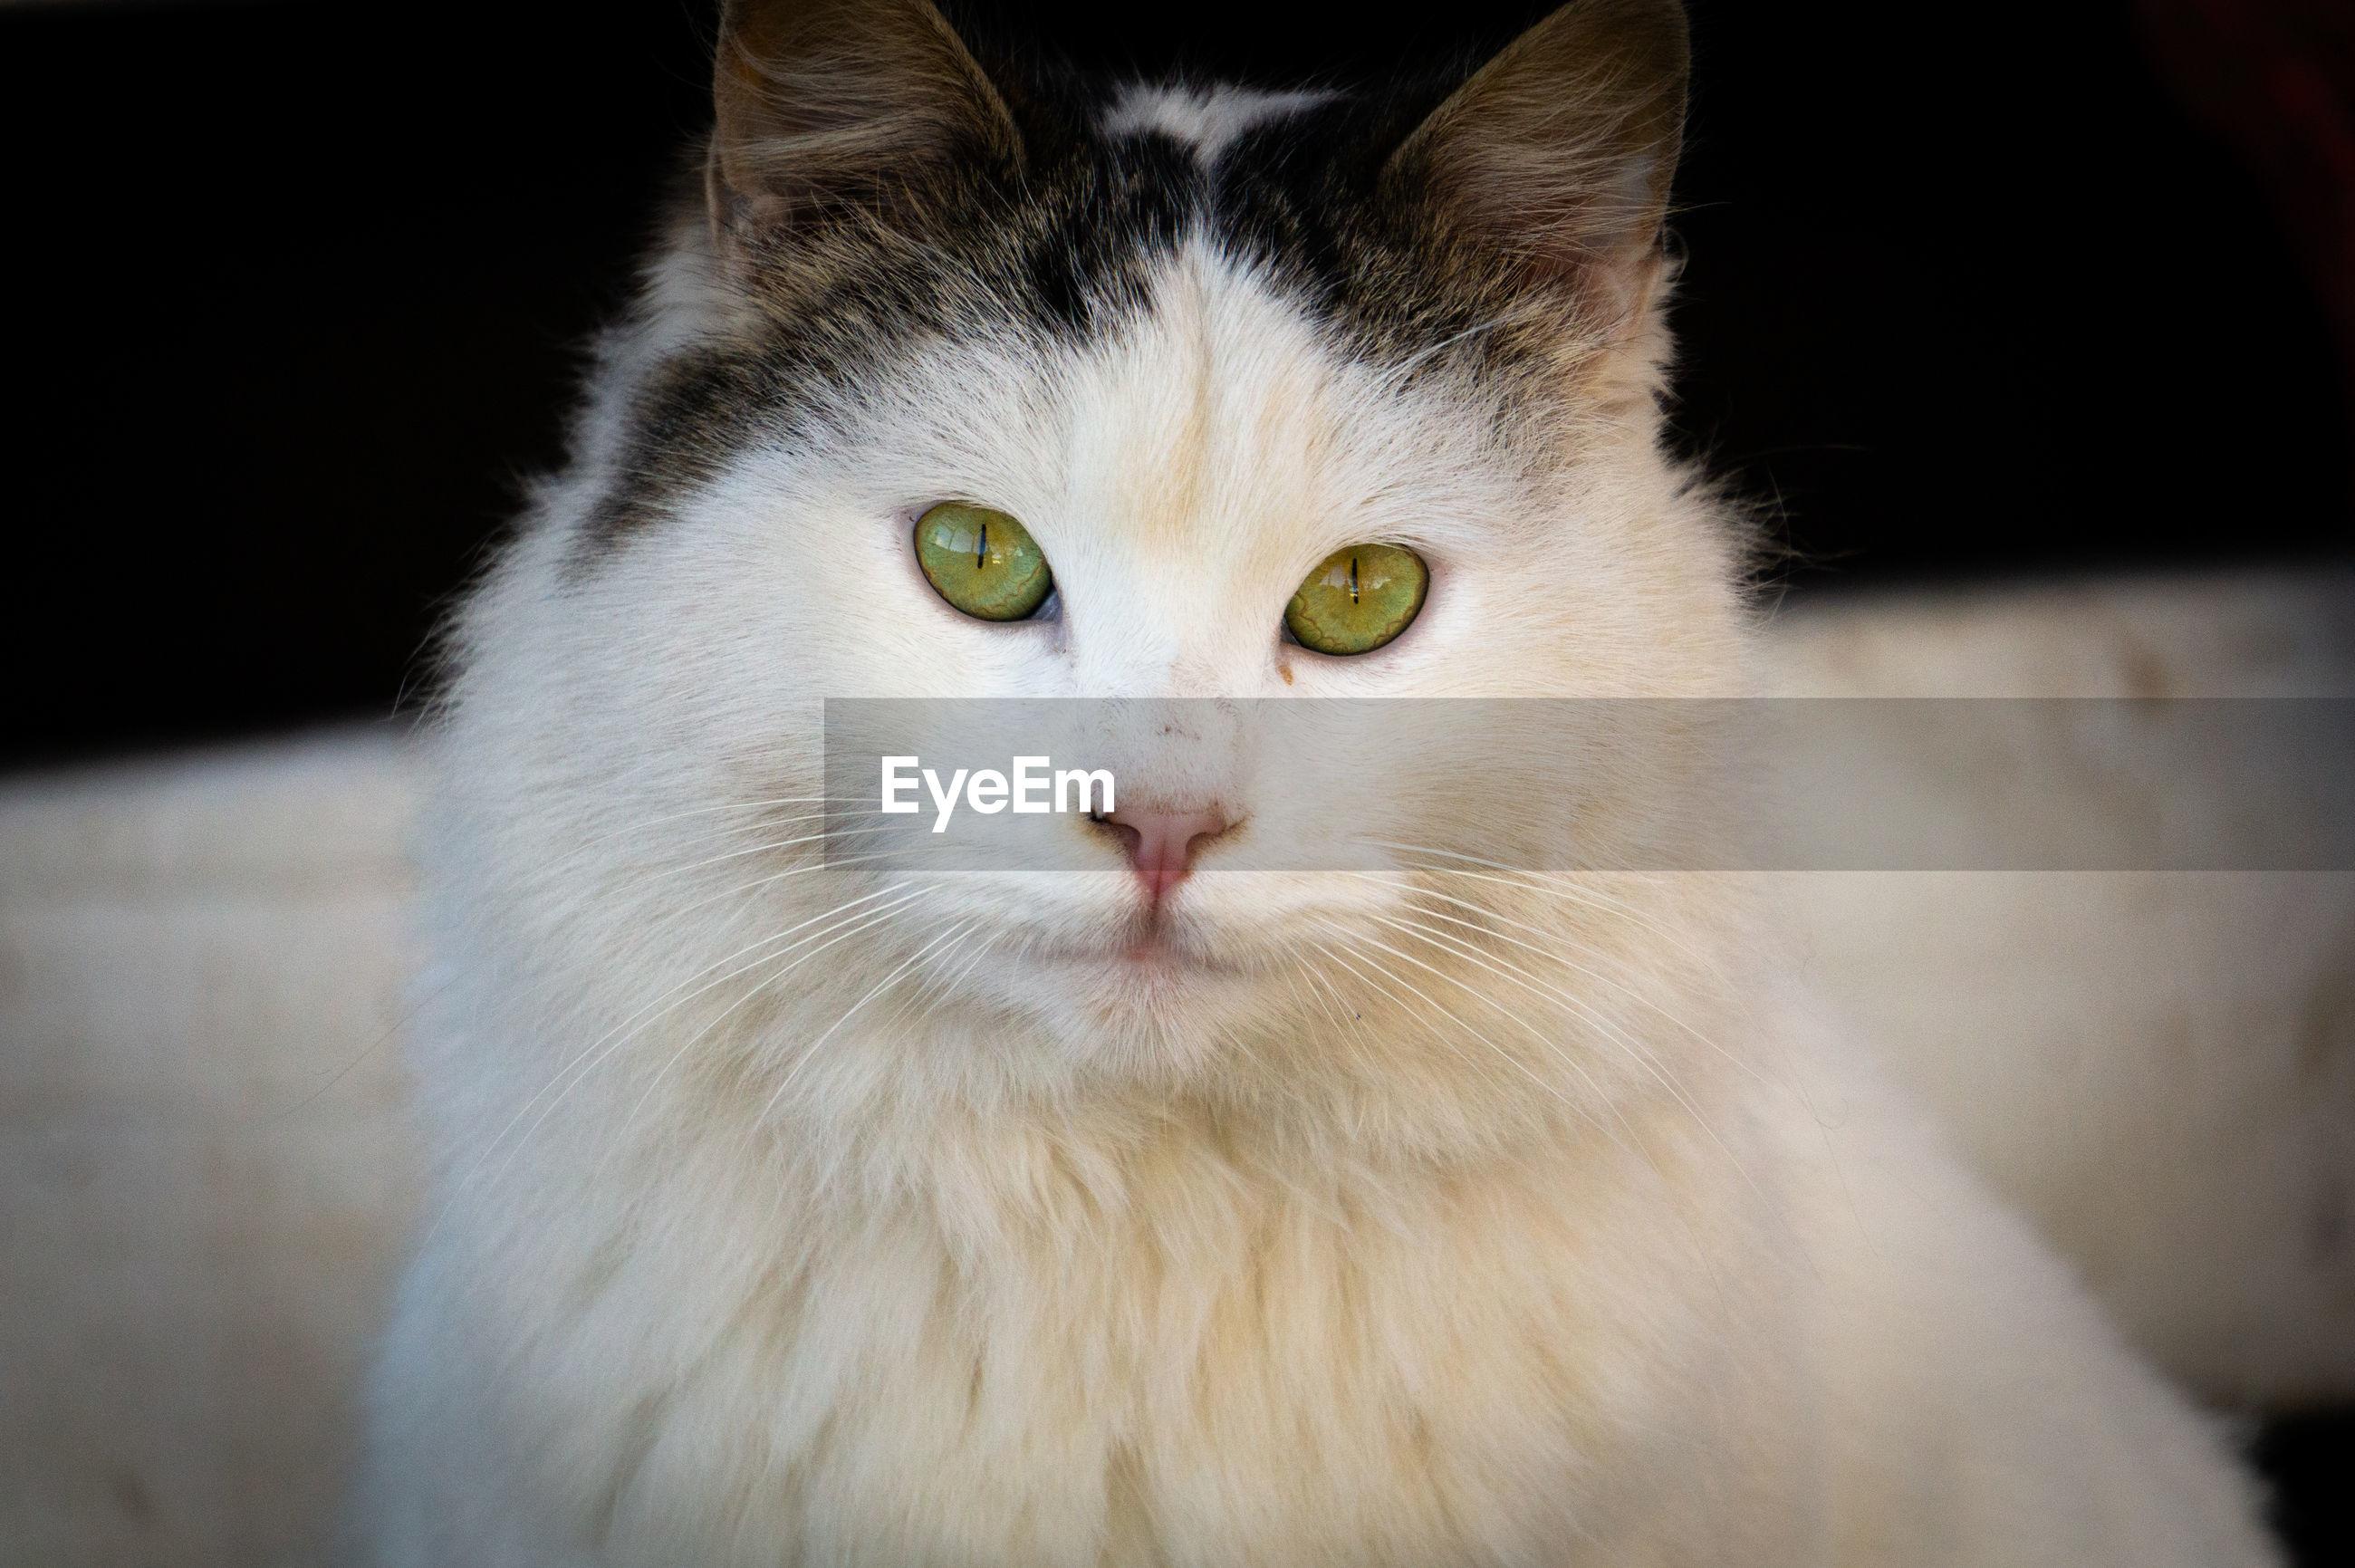 Close-up portrait of white cat